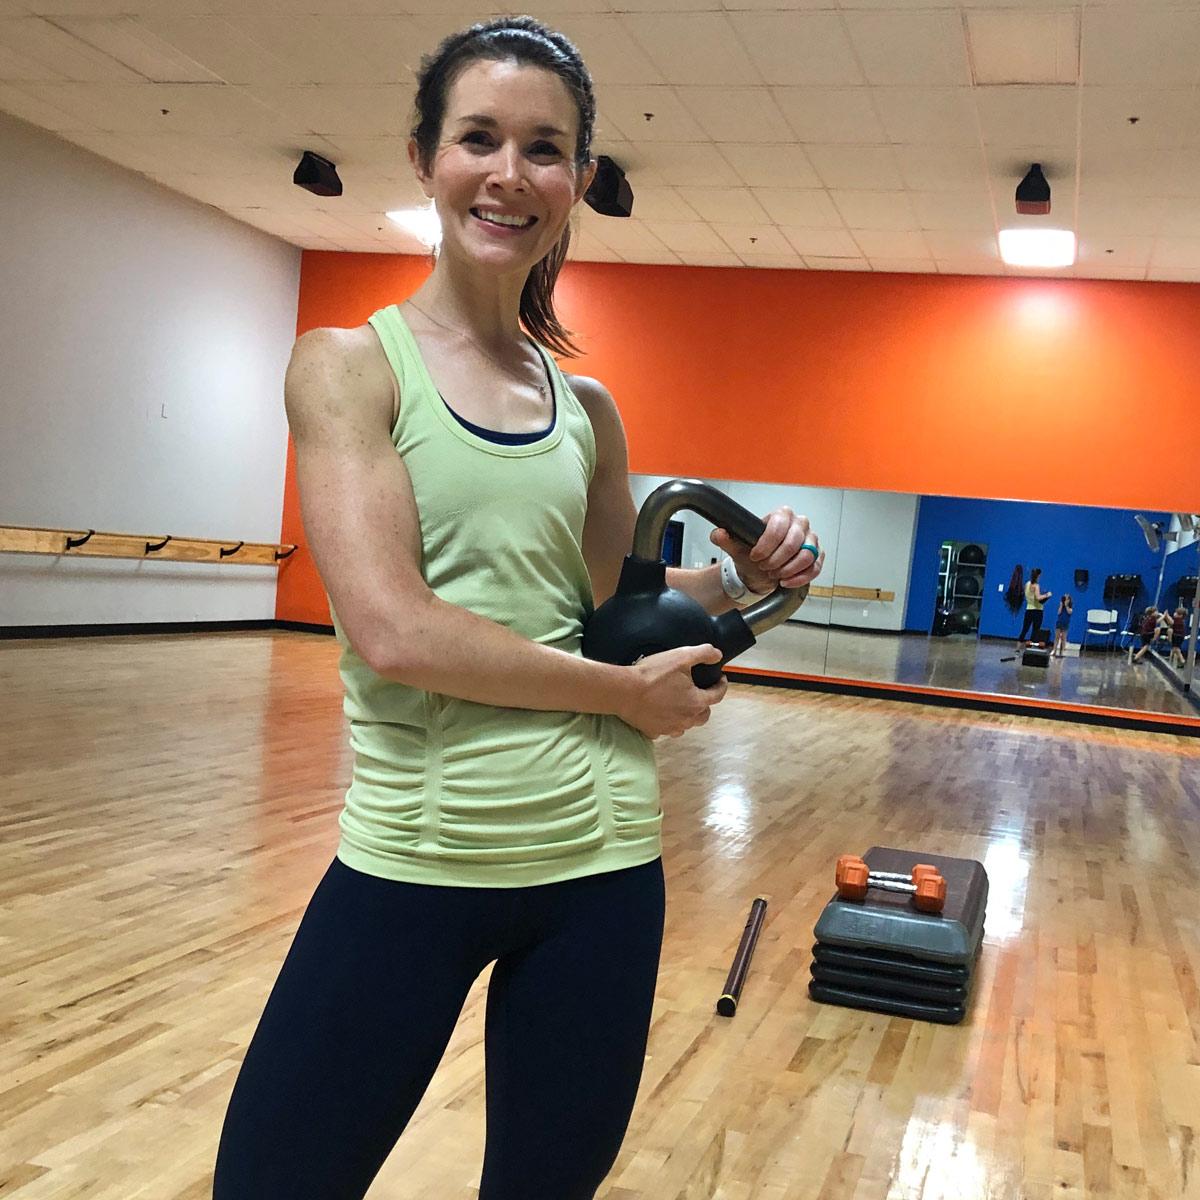 Workout Trainer by Skimble: Trainer Spotlight: Janet Harritt